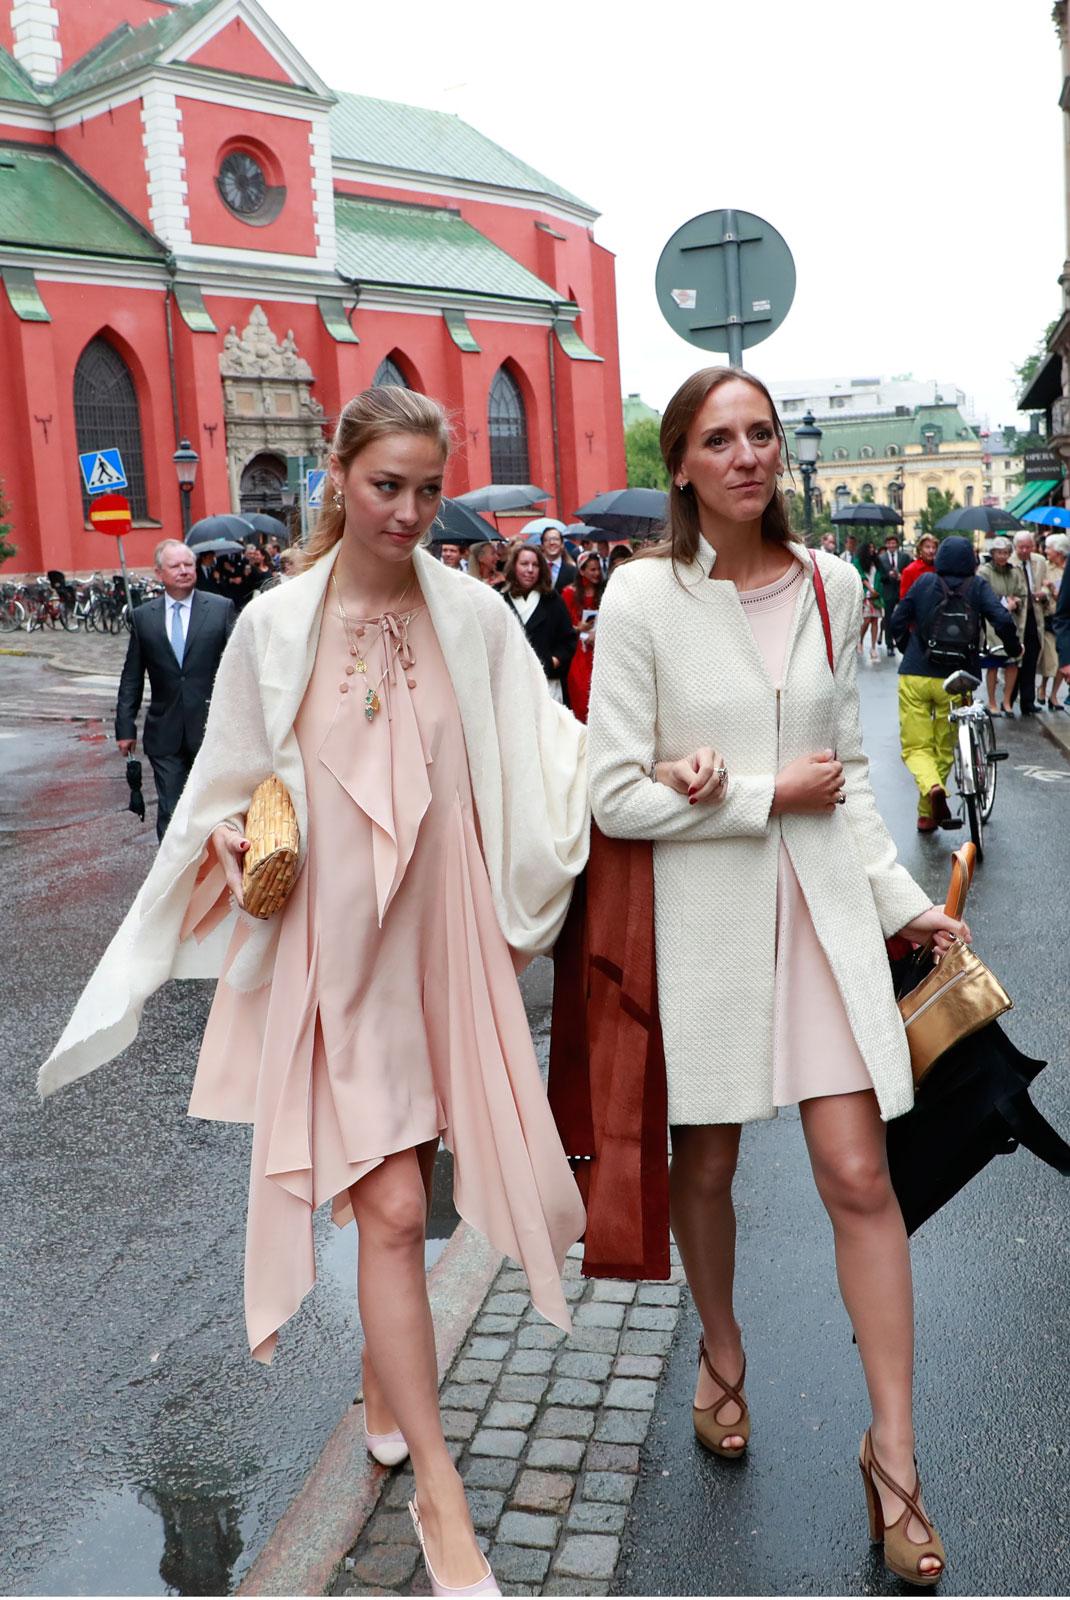 Brittany norman fashion broker OFS Hodon n - Okresn fotbalov svaz